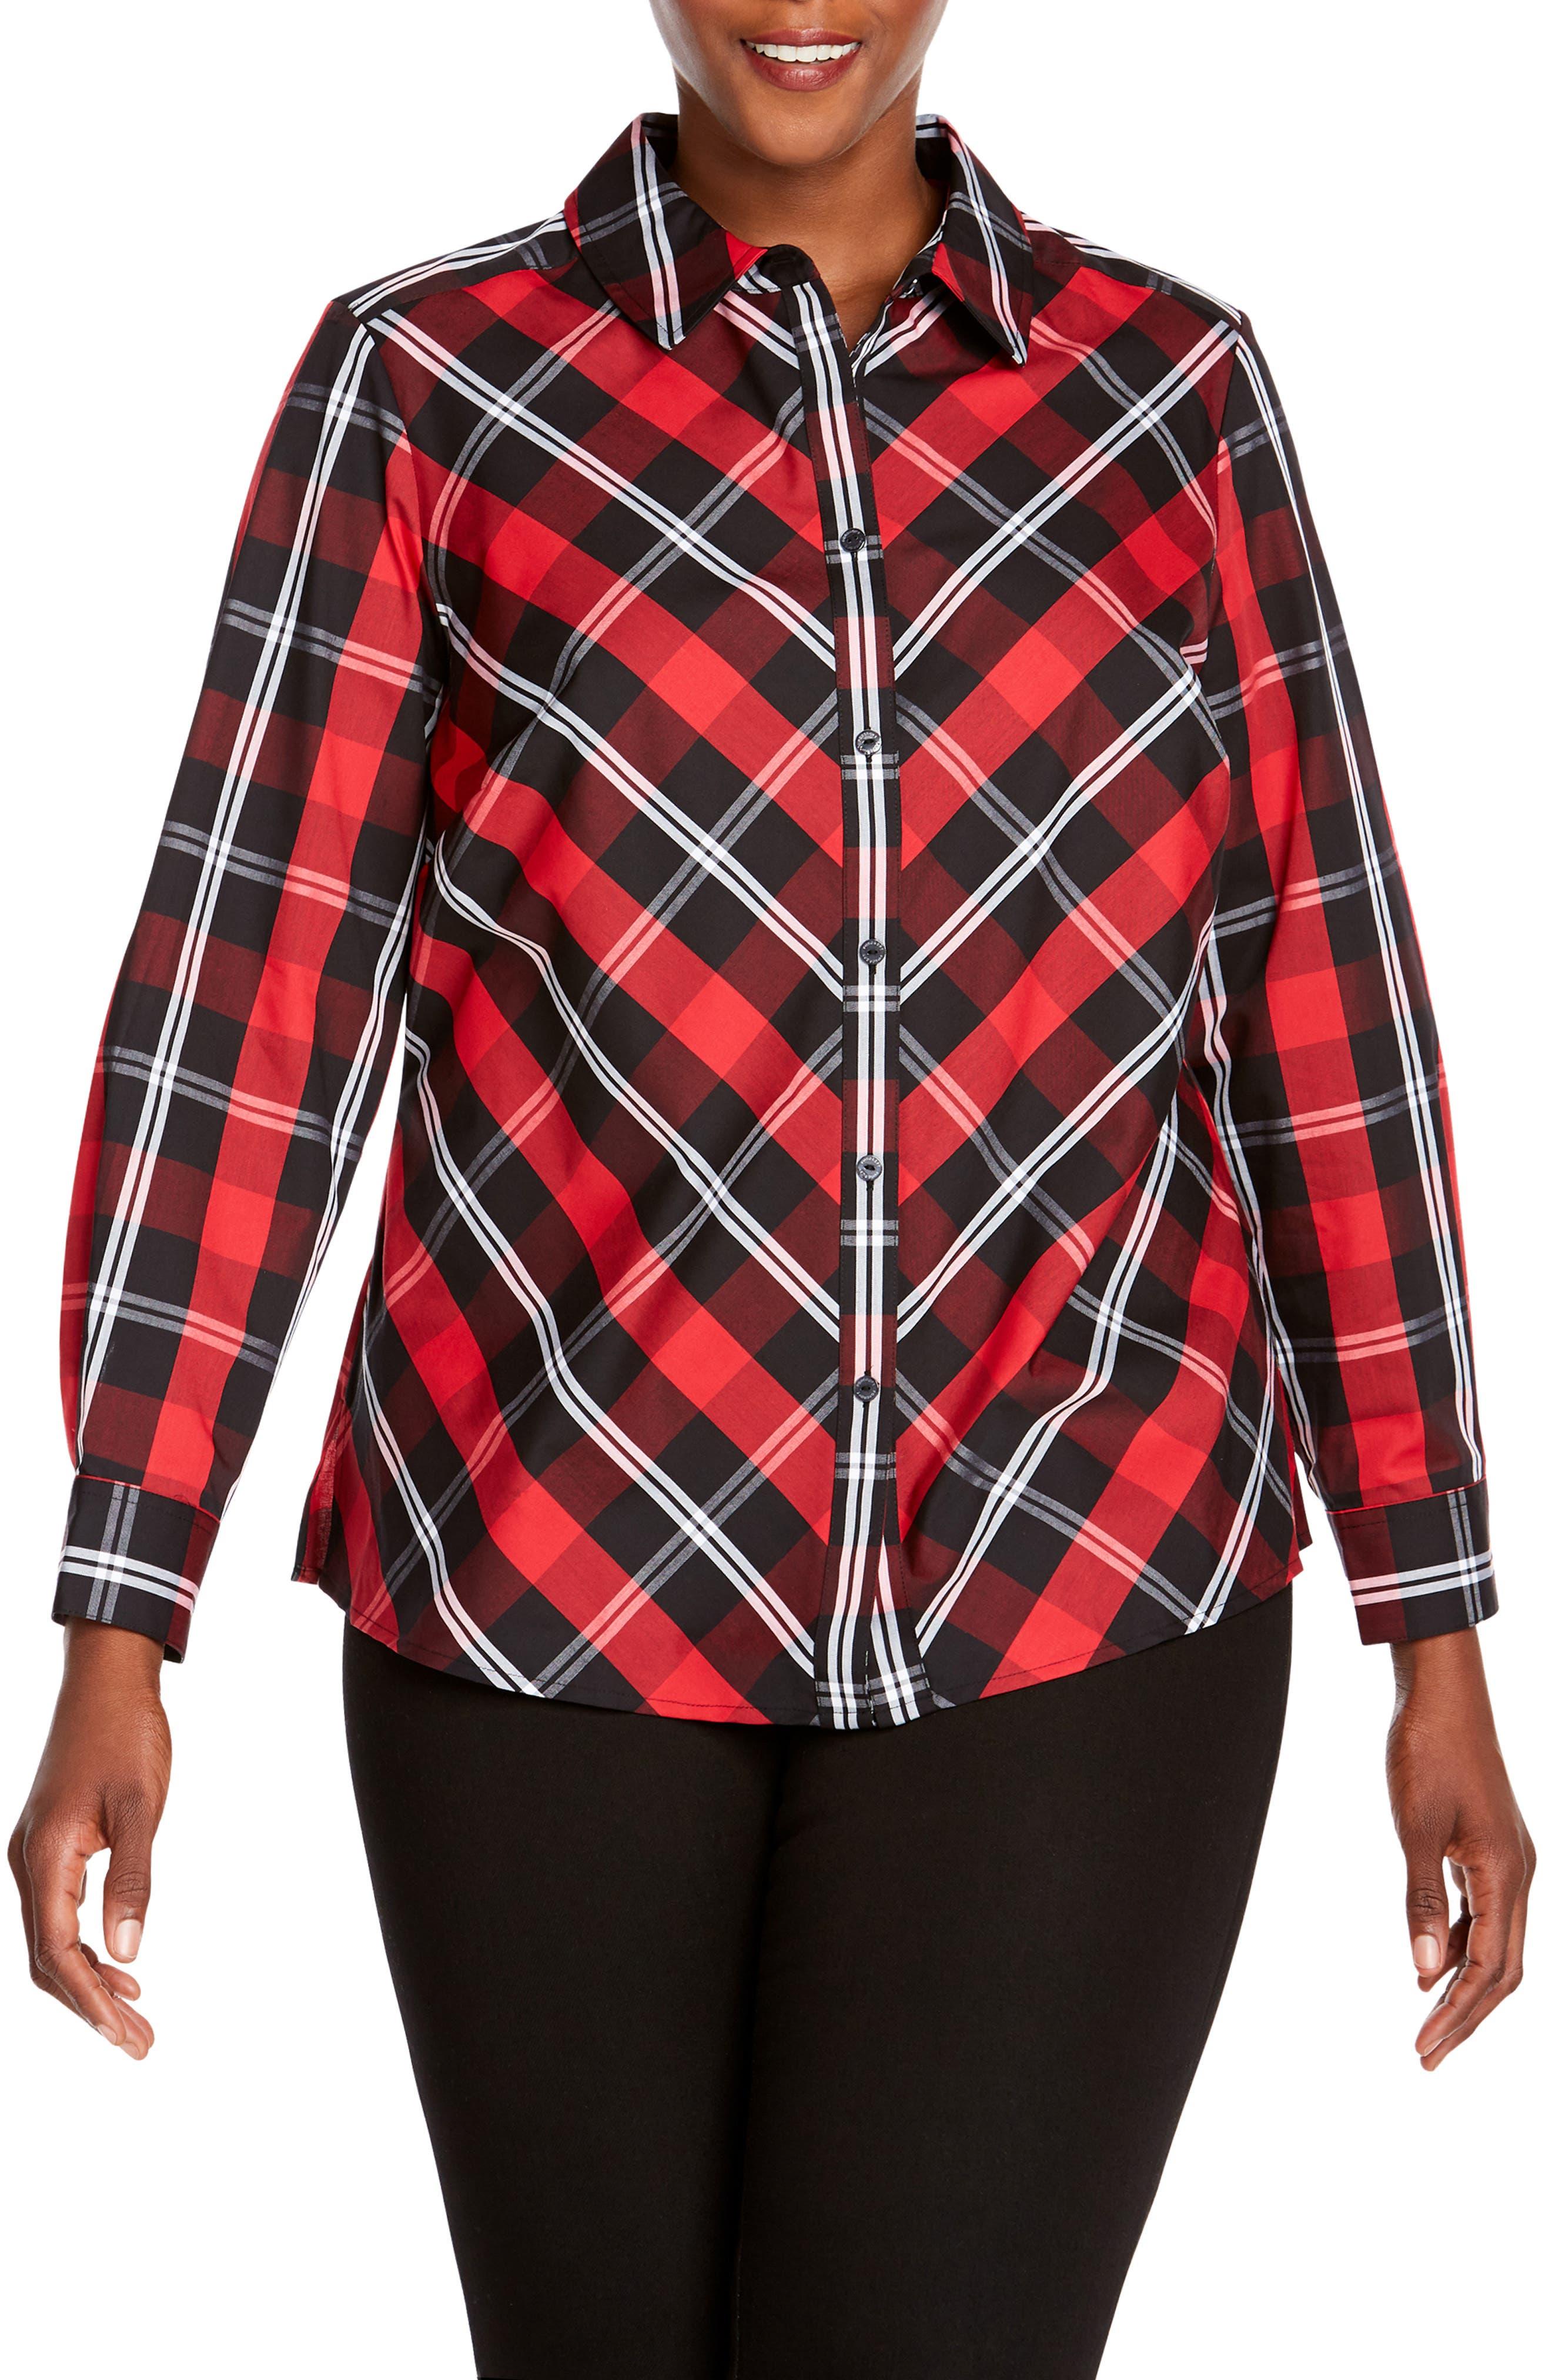 Tina Mackenzie Tartan Plaid Shirt,                             Main thumbnail 1, color,                             BLACK/ RED